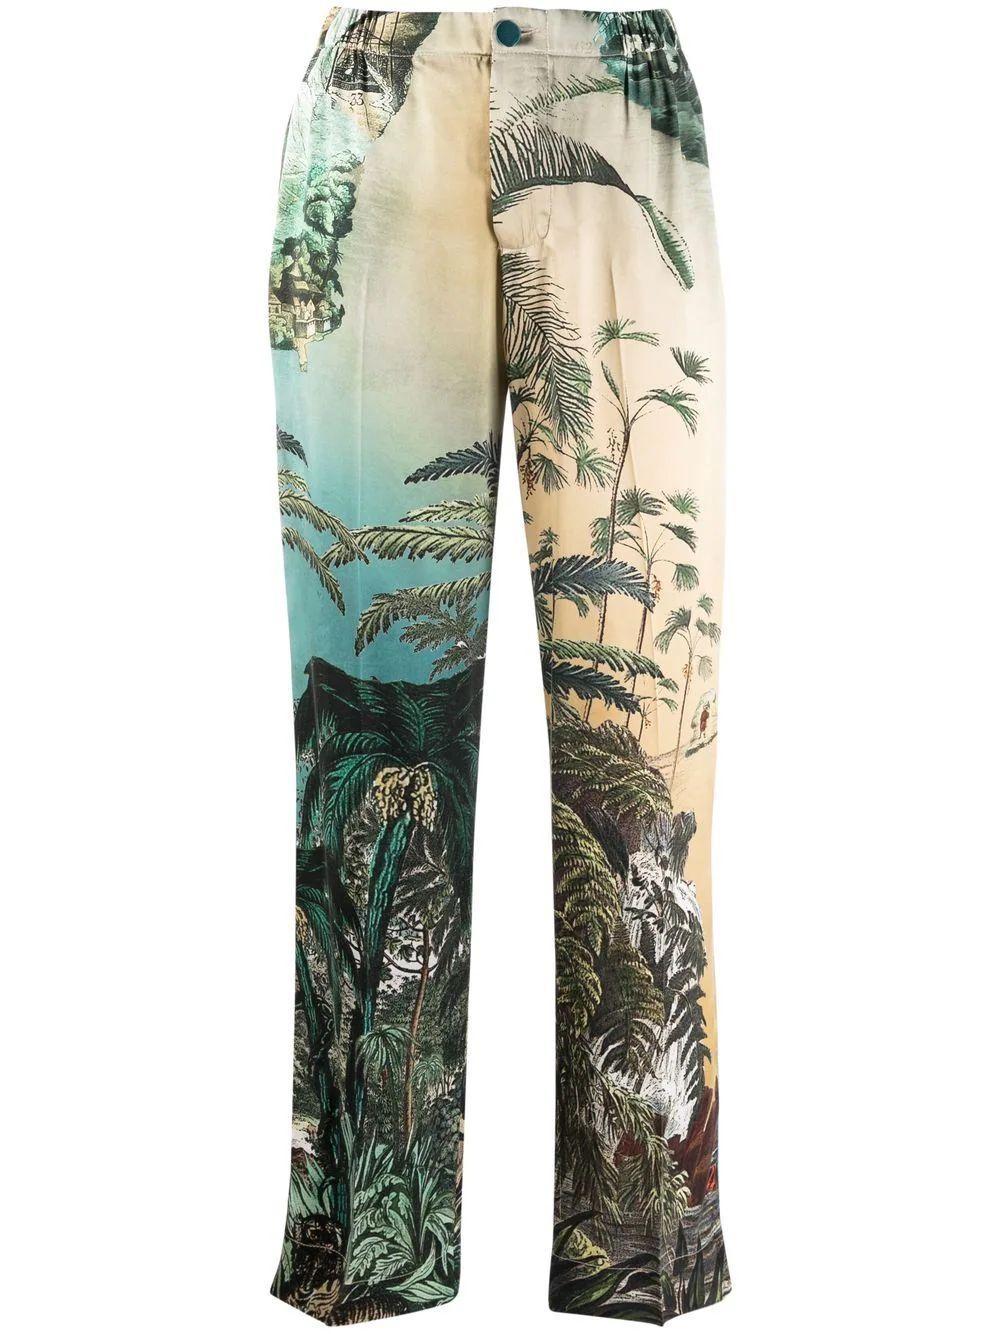 Jungle Print Pants Item # PA002086-TE00591